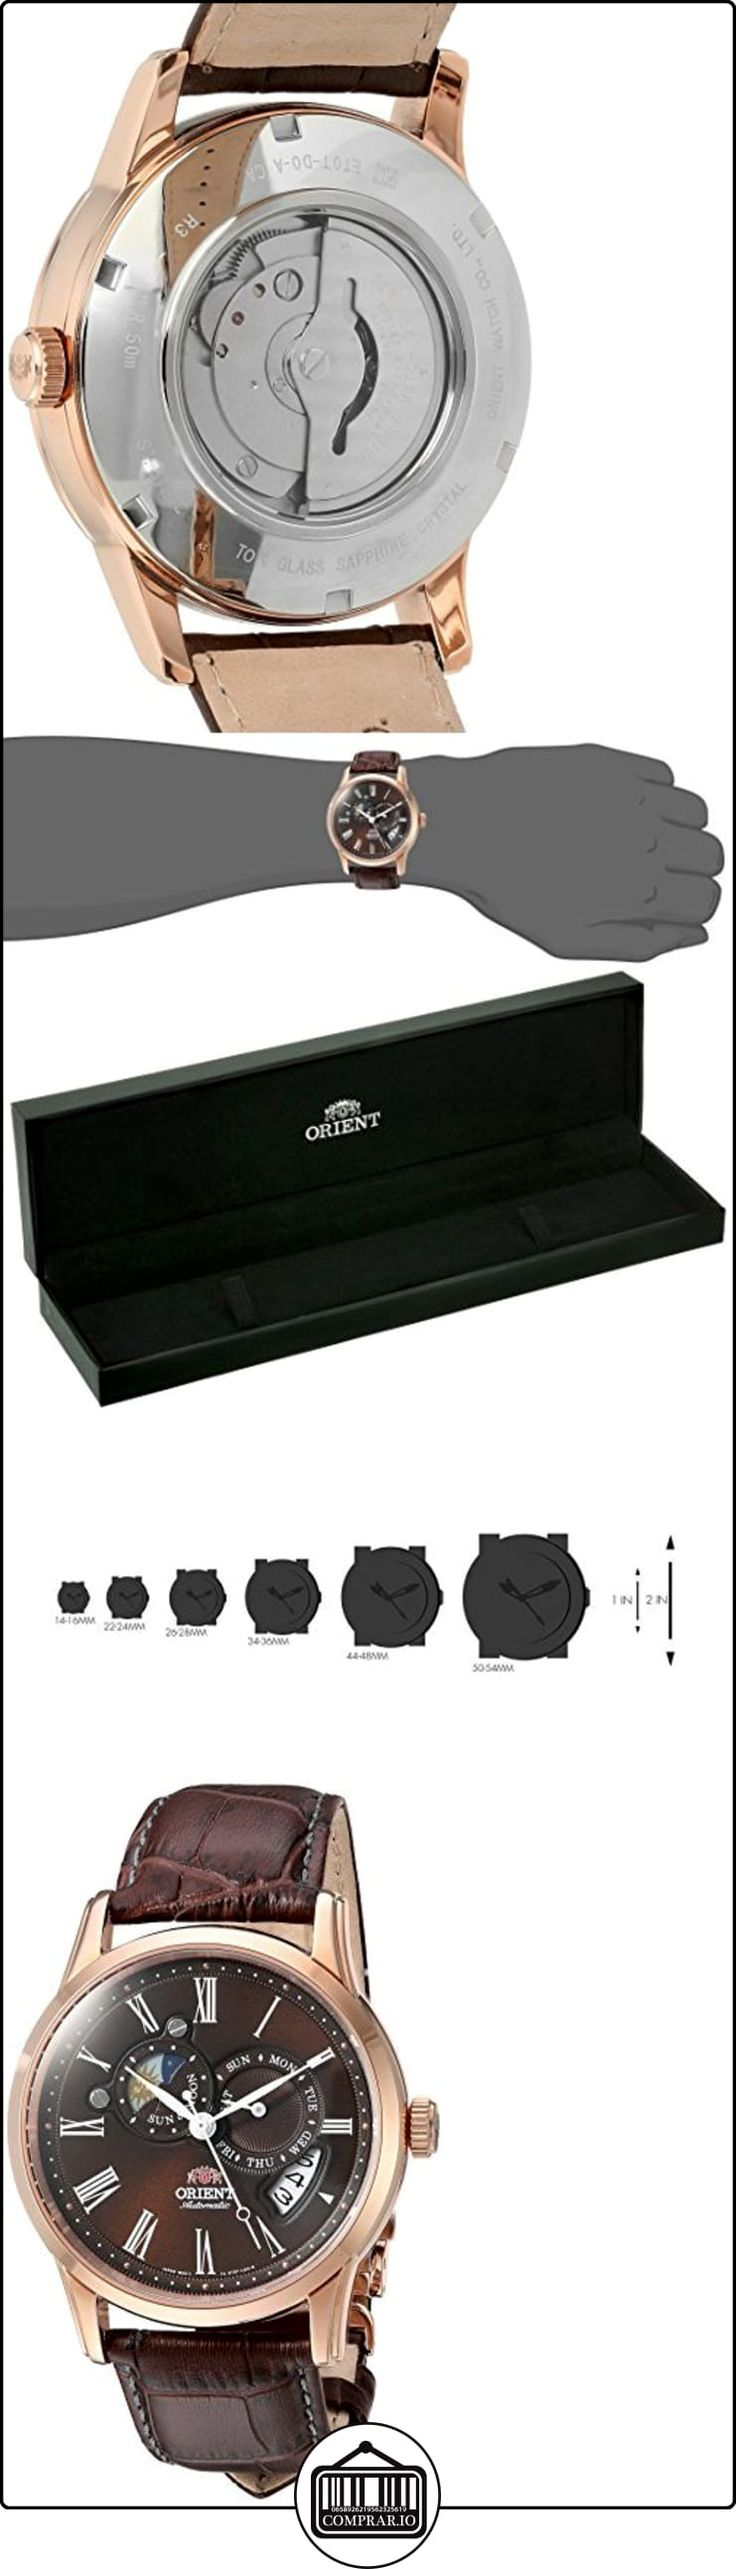 Orient Men's 42.5mm Automatic Brown Calfskin Mineral Glass Date Watch FET0T003T0  ✿ Relojes para hombre - (Lujo) ✿